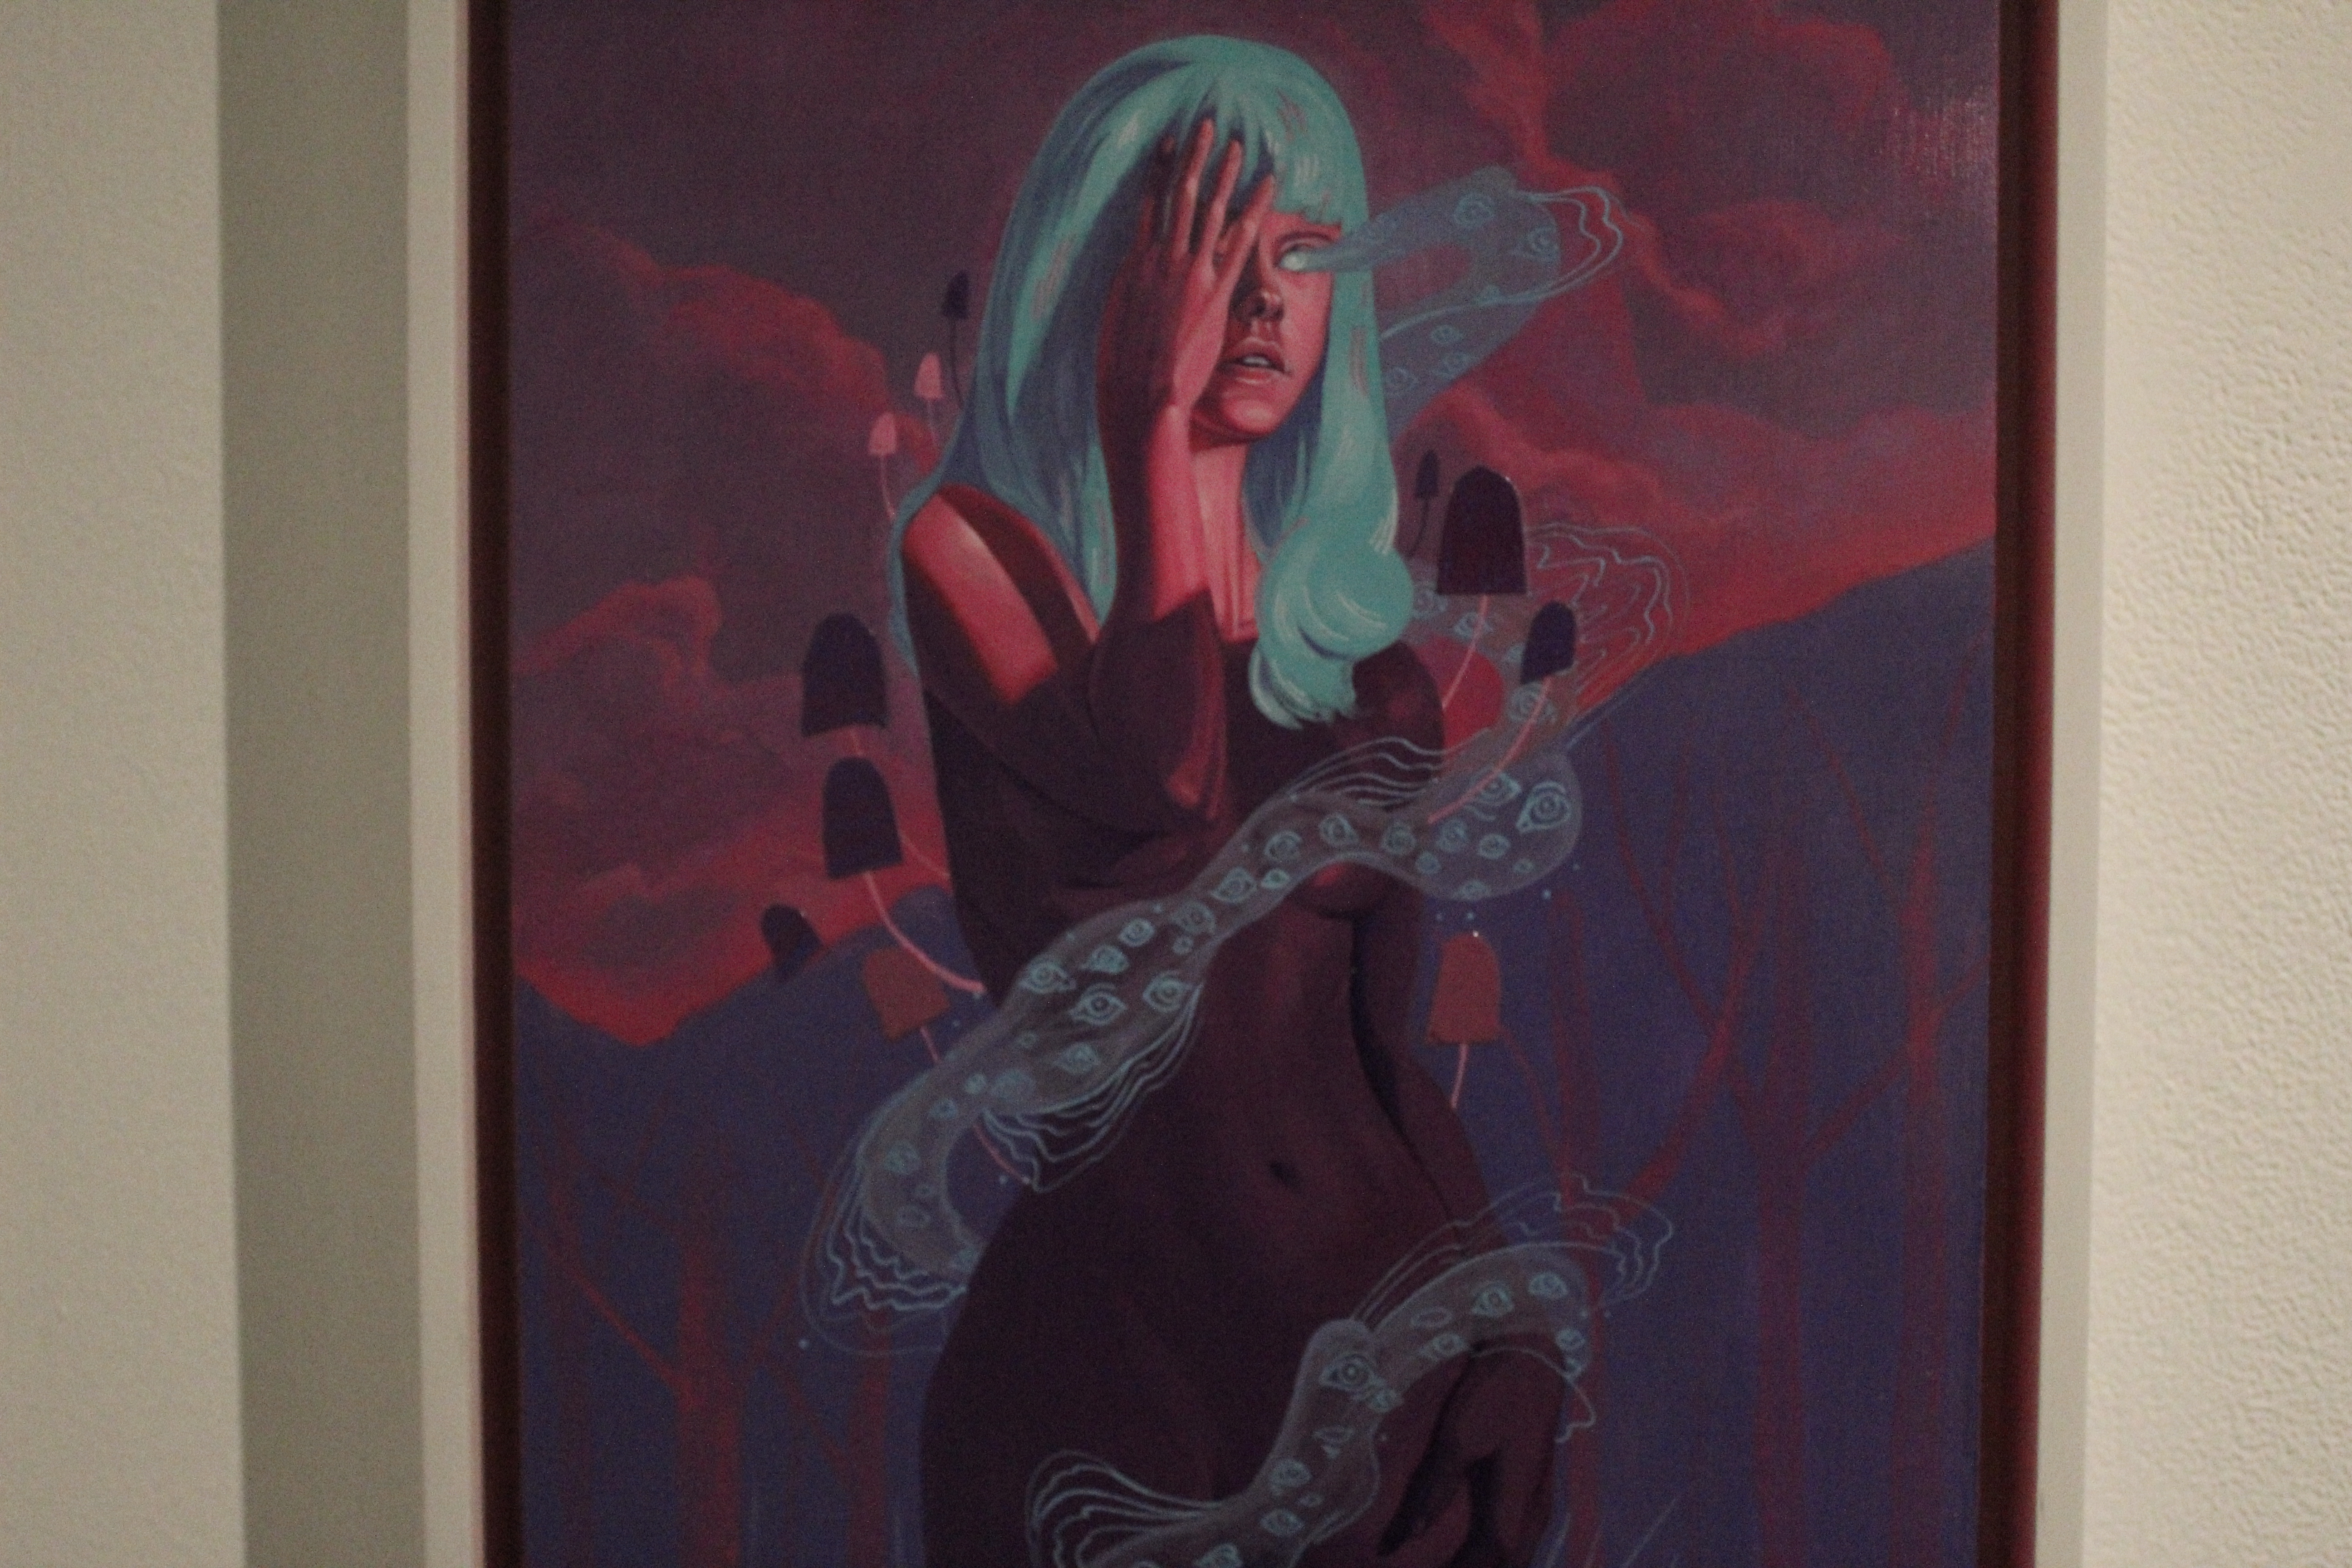 Unseen Shadows by Michael Camarra